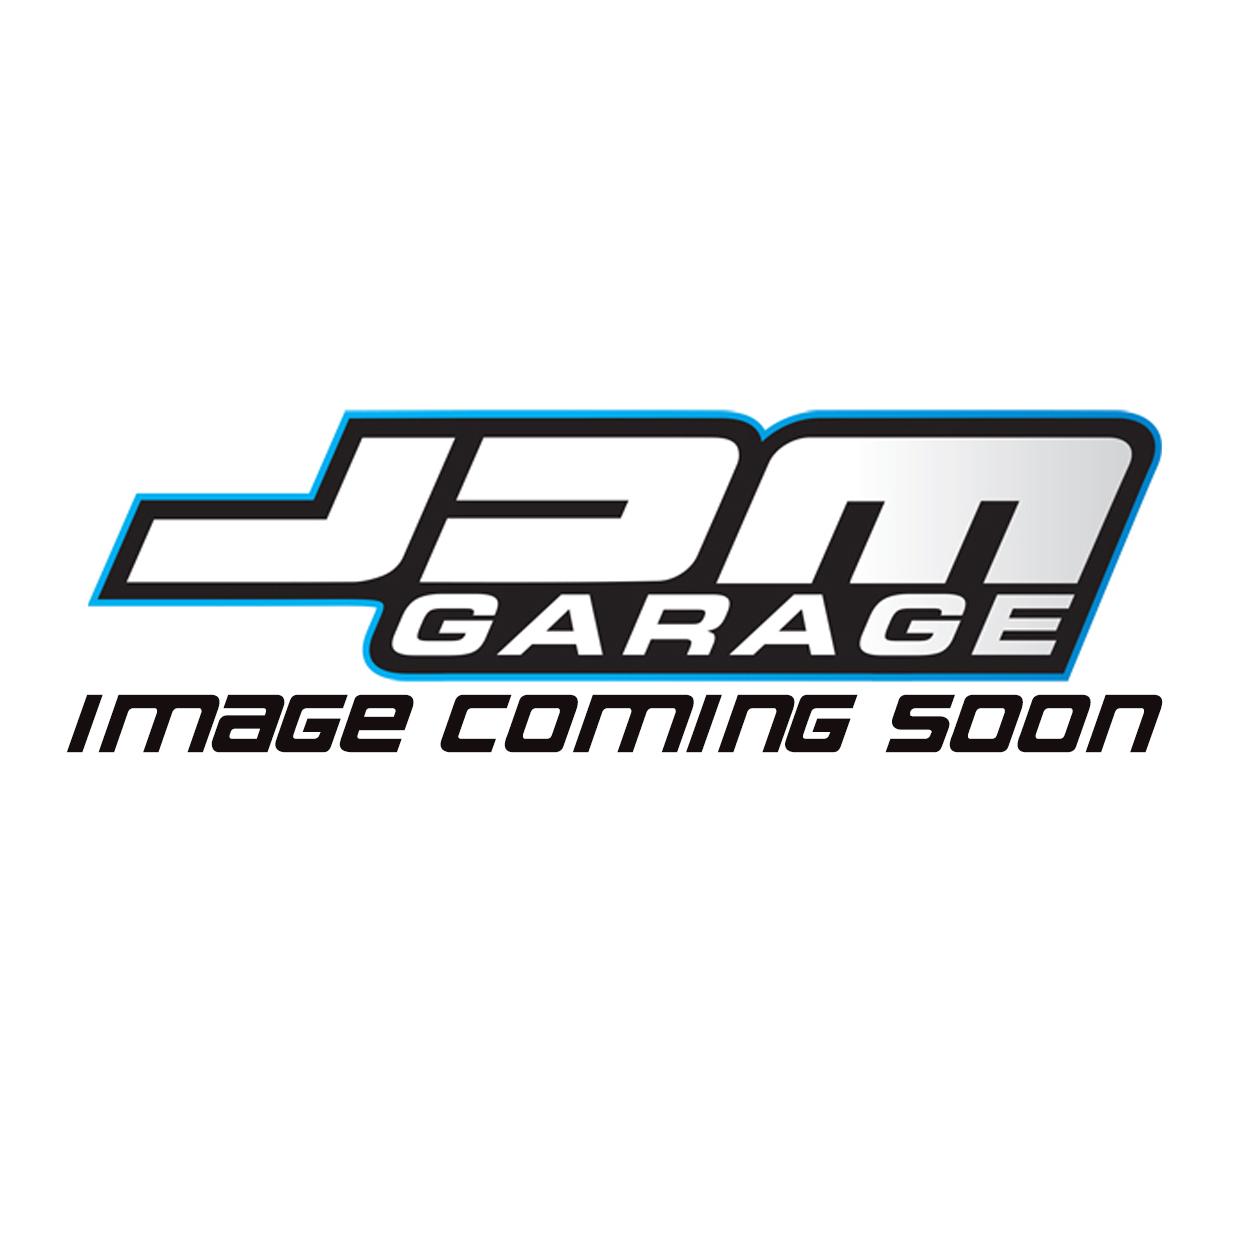 Haltech Elite 1000 ECU Mazda Miata (MX-5) NB With Plug'n'Play Adaptor Harness Kit